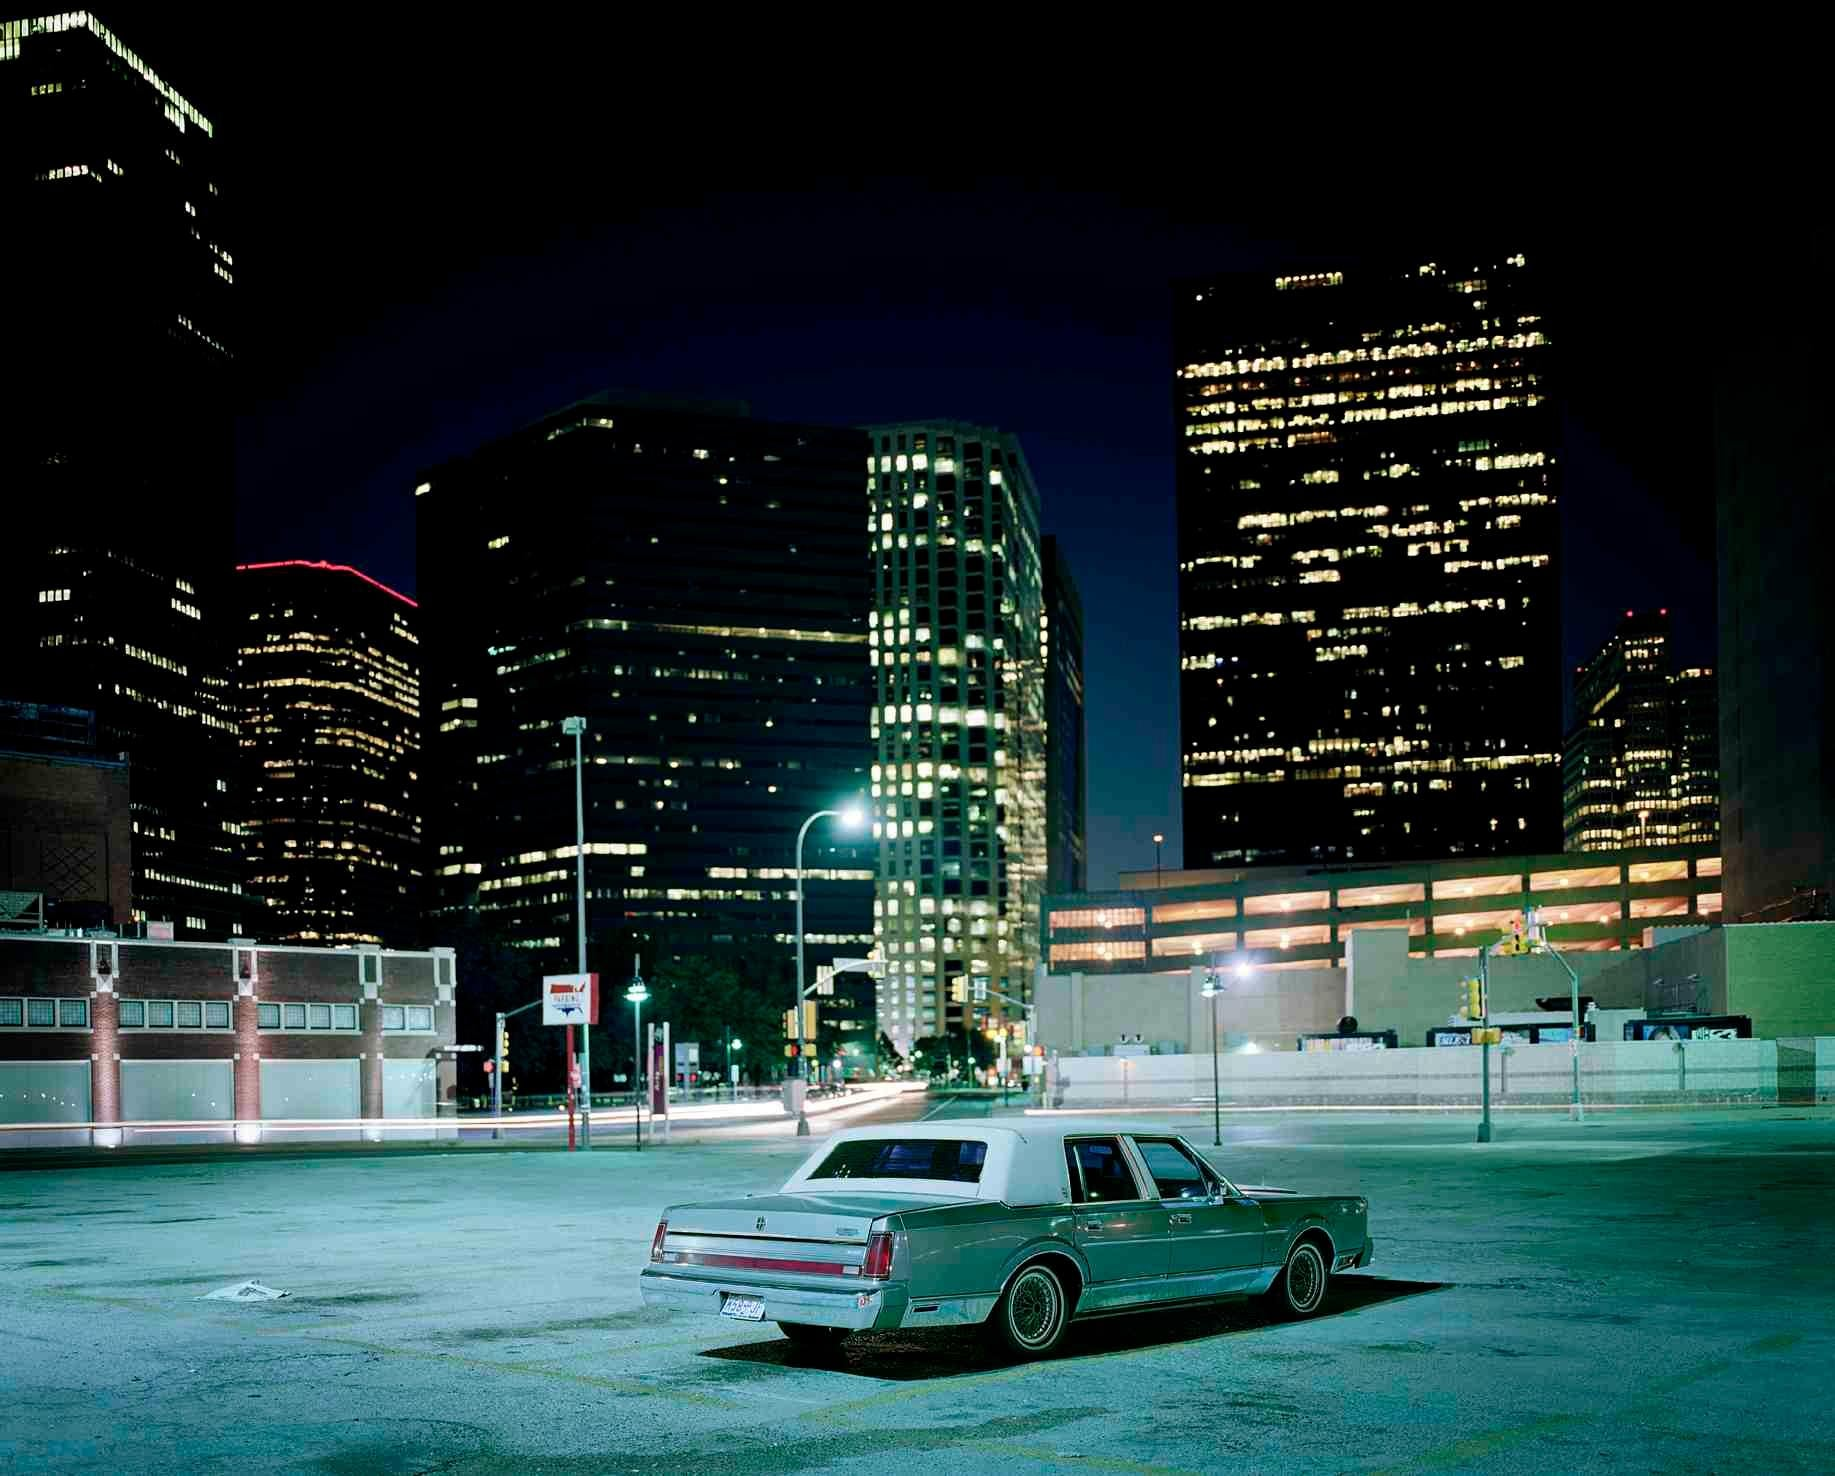 Car, Downtown Car Park, Dallas, Texas, 2006 - Samuel Hicks, Ford, USA, Photo